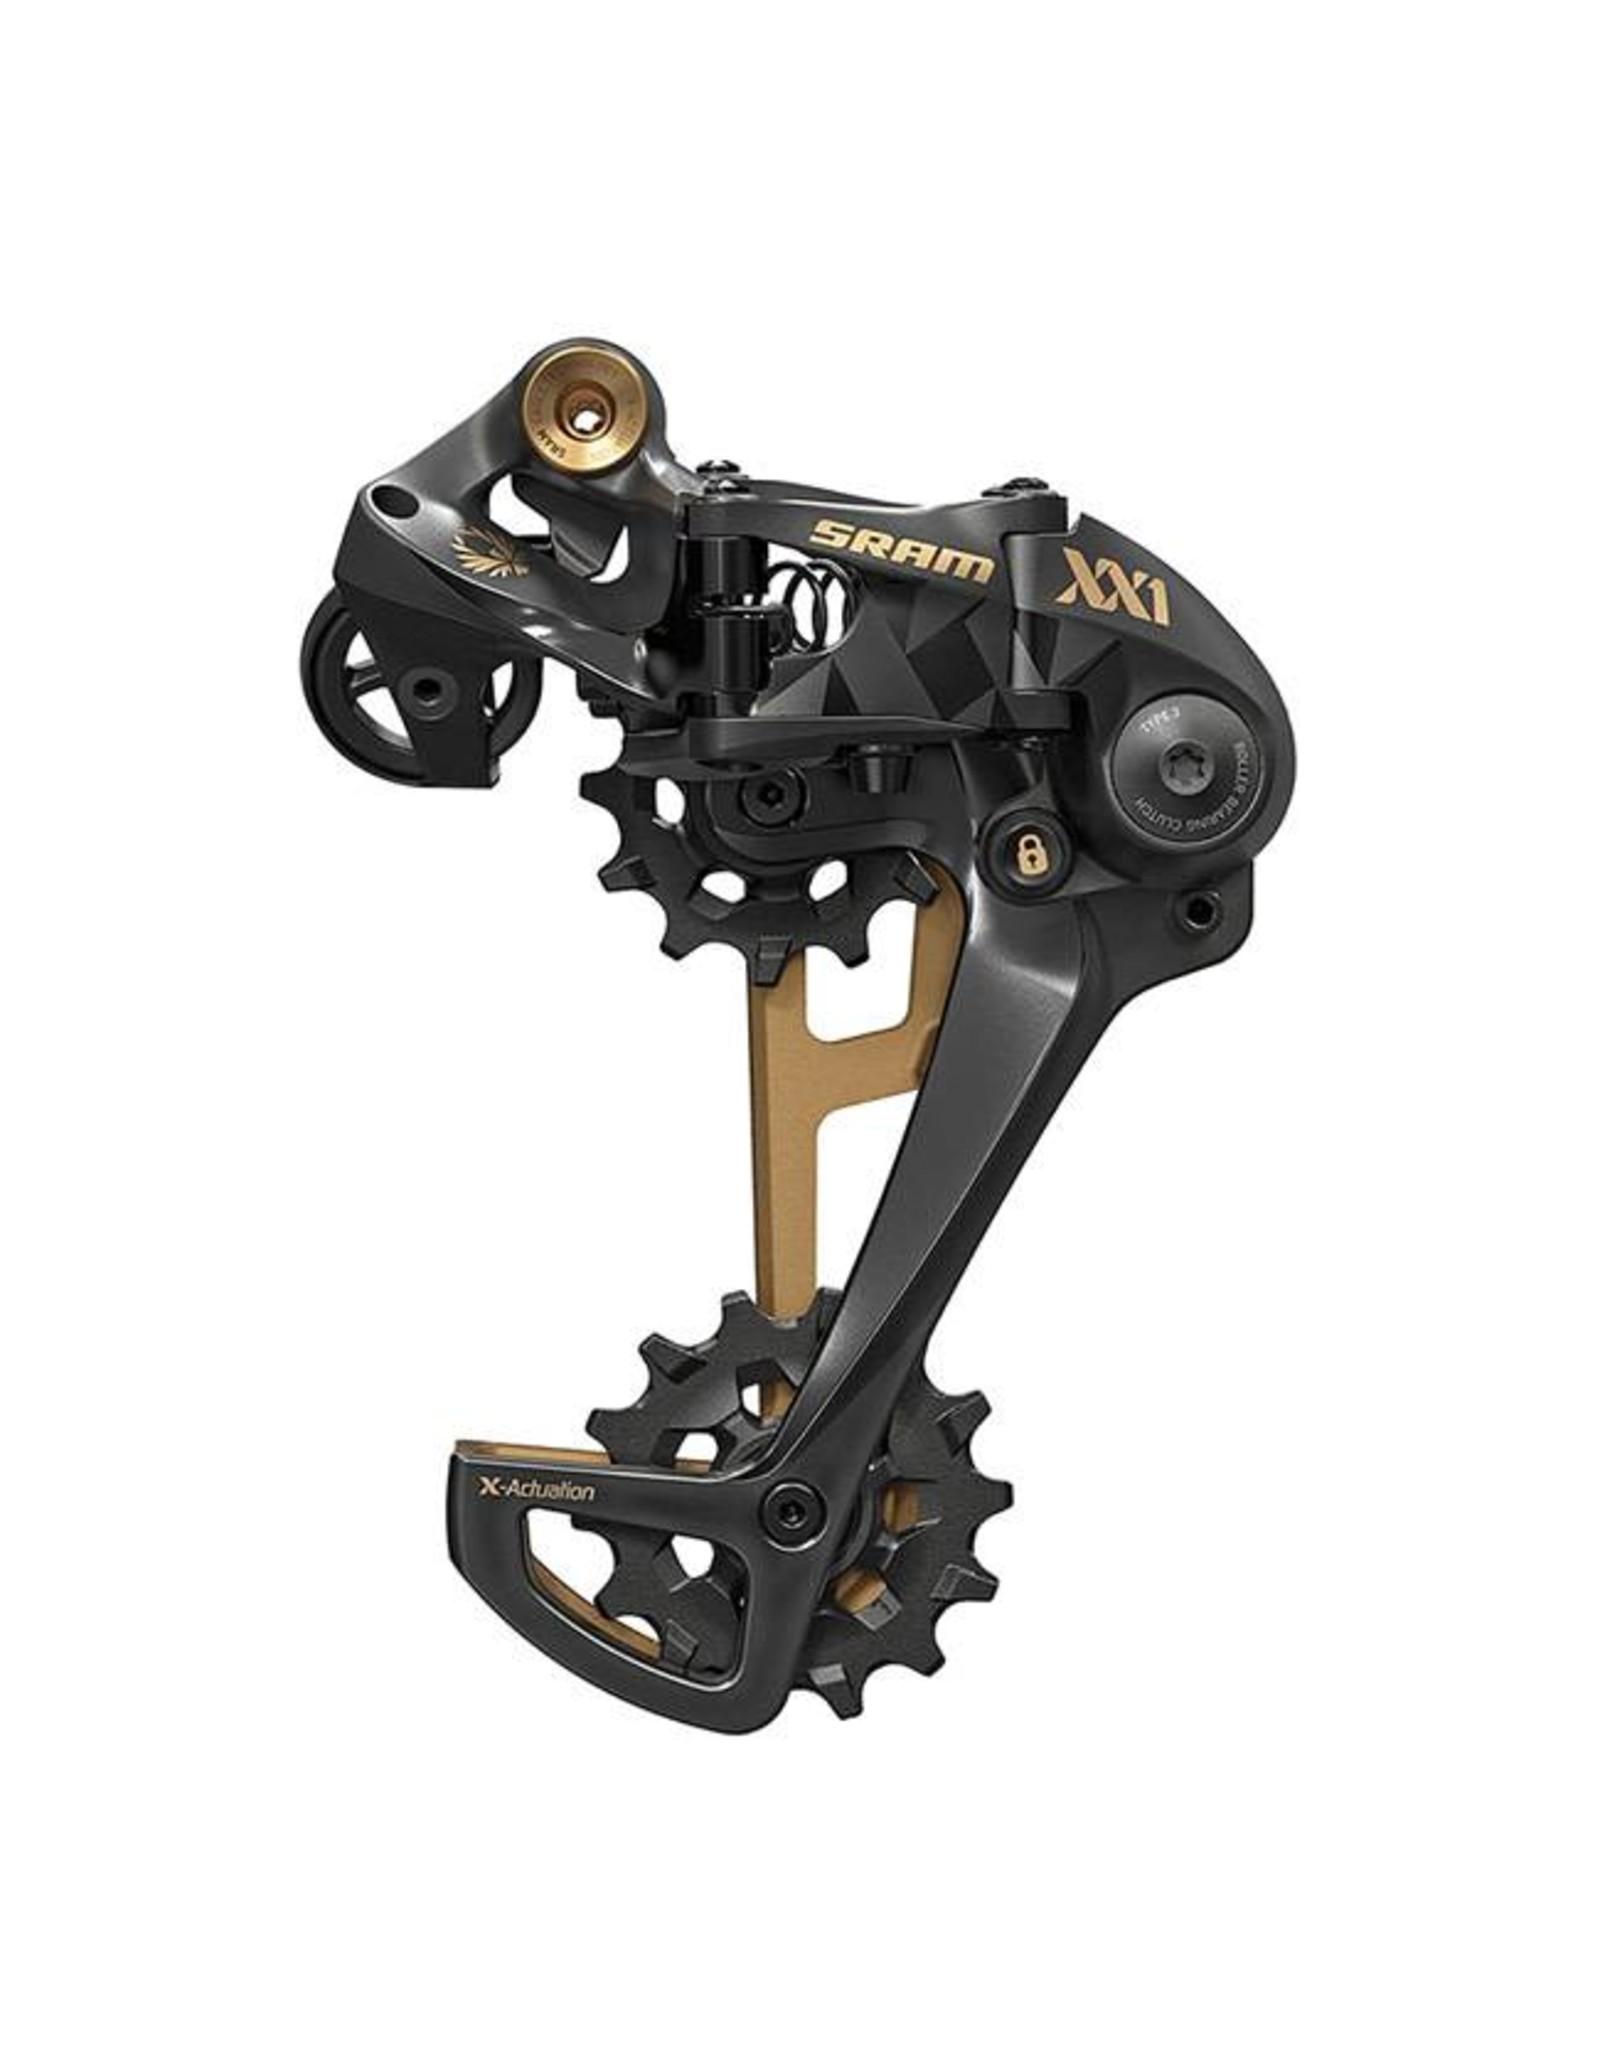 SRAM SRAM XX1 Eagle 12-Speed Type 3 Rear Derailleur, Black with Gold Trim